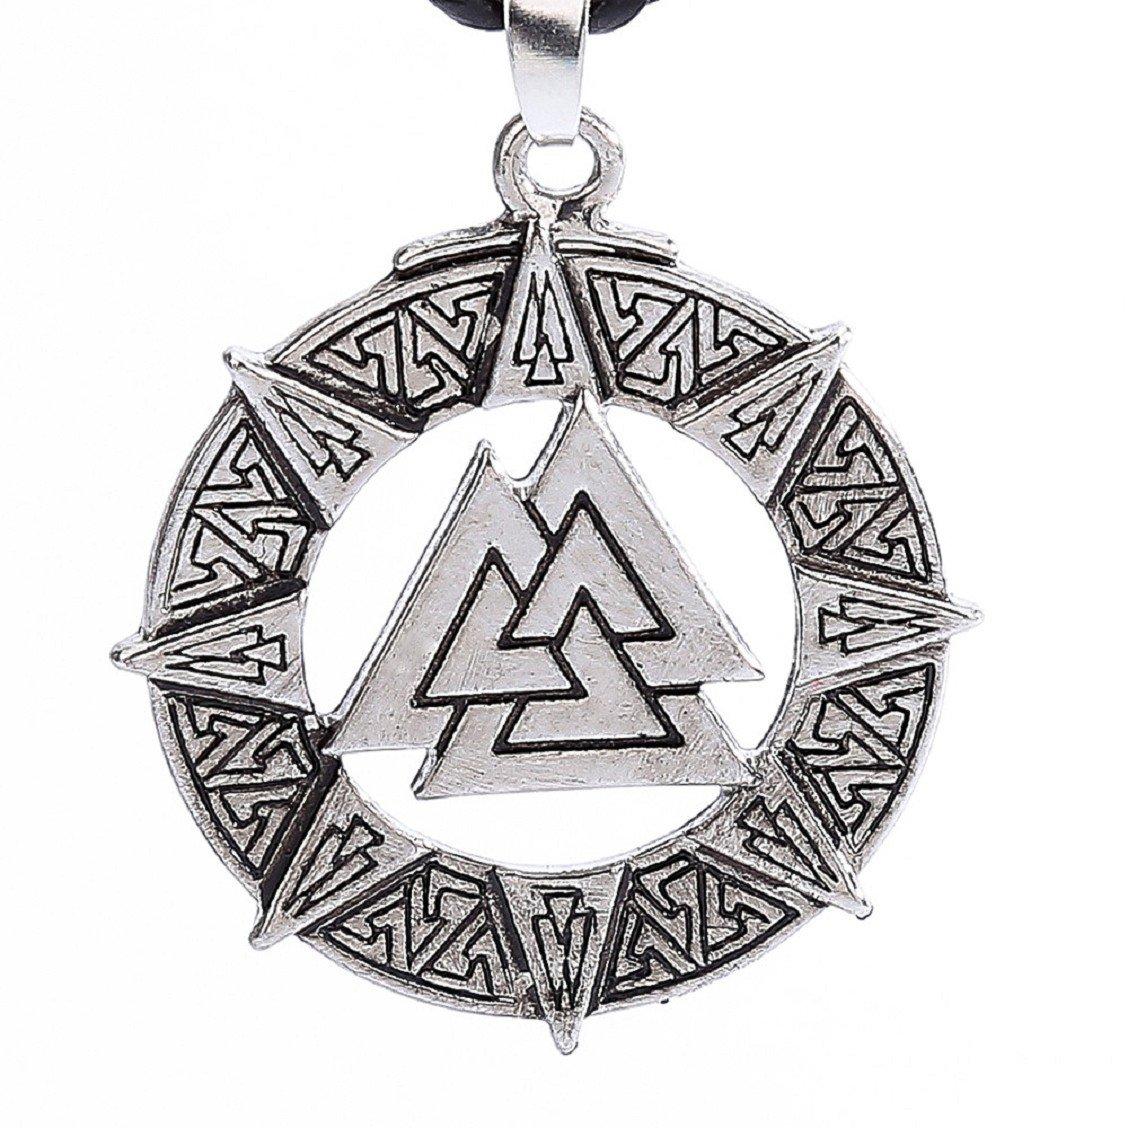 Naladoo Slavic Norway Valknut Pagoda Amulet Pendant Men Necklace Jewelry Warrior Symbol Valentine's Day Gift